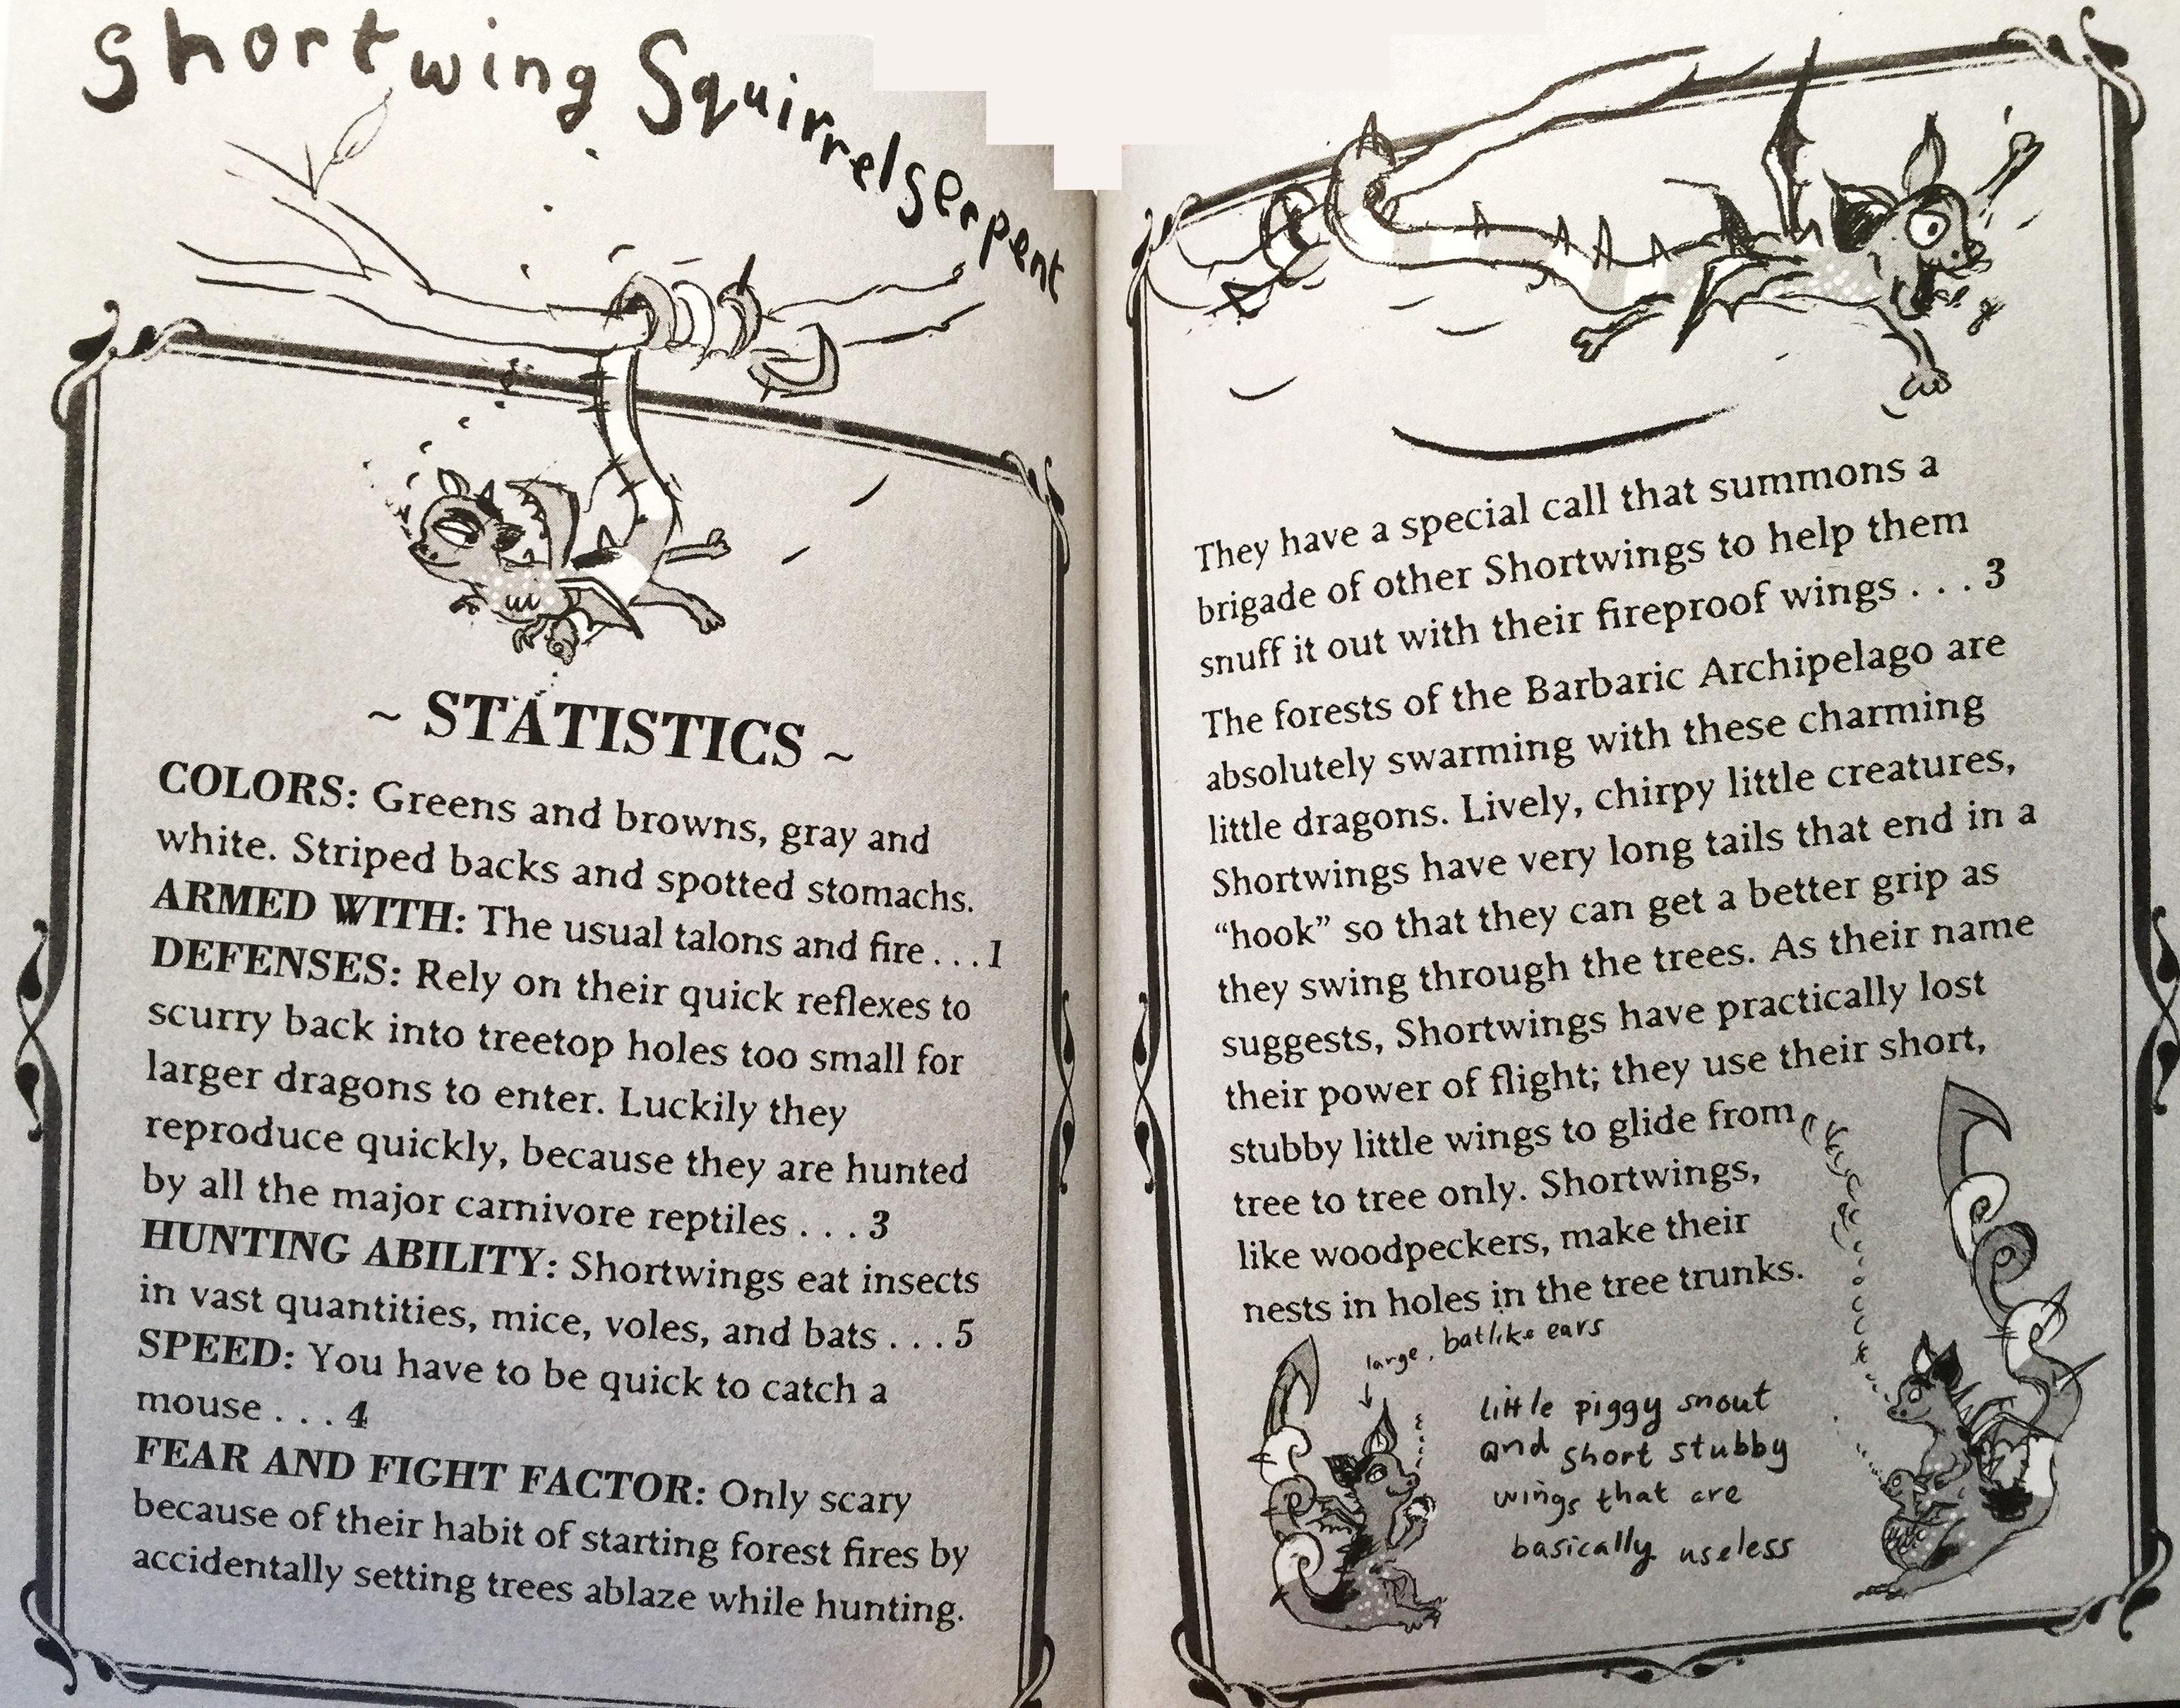 ShortwingSquirrelserpent